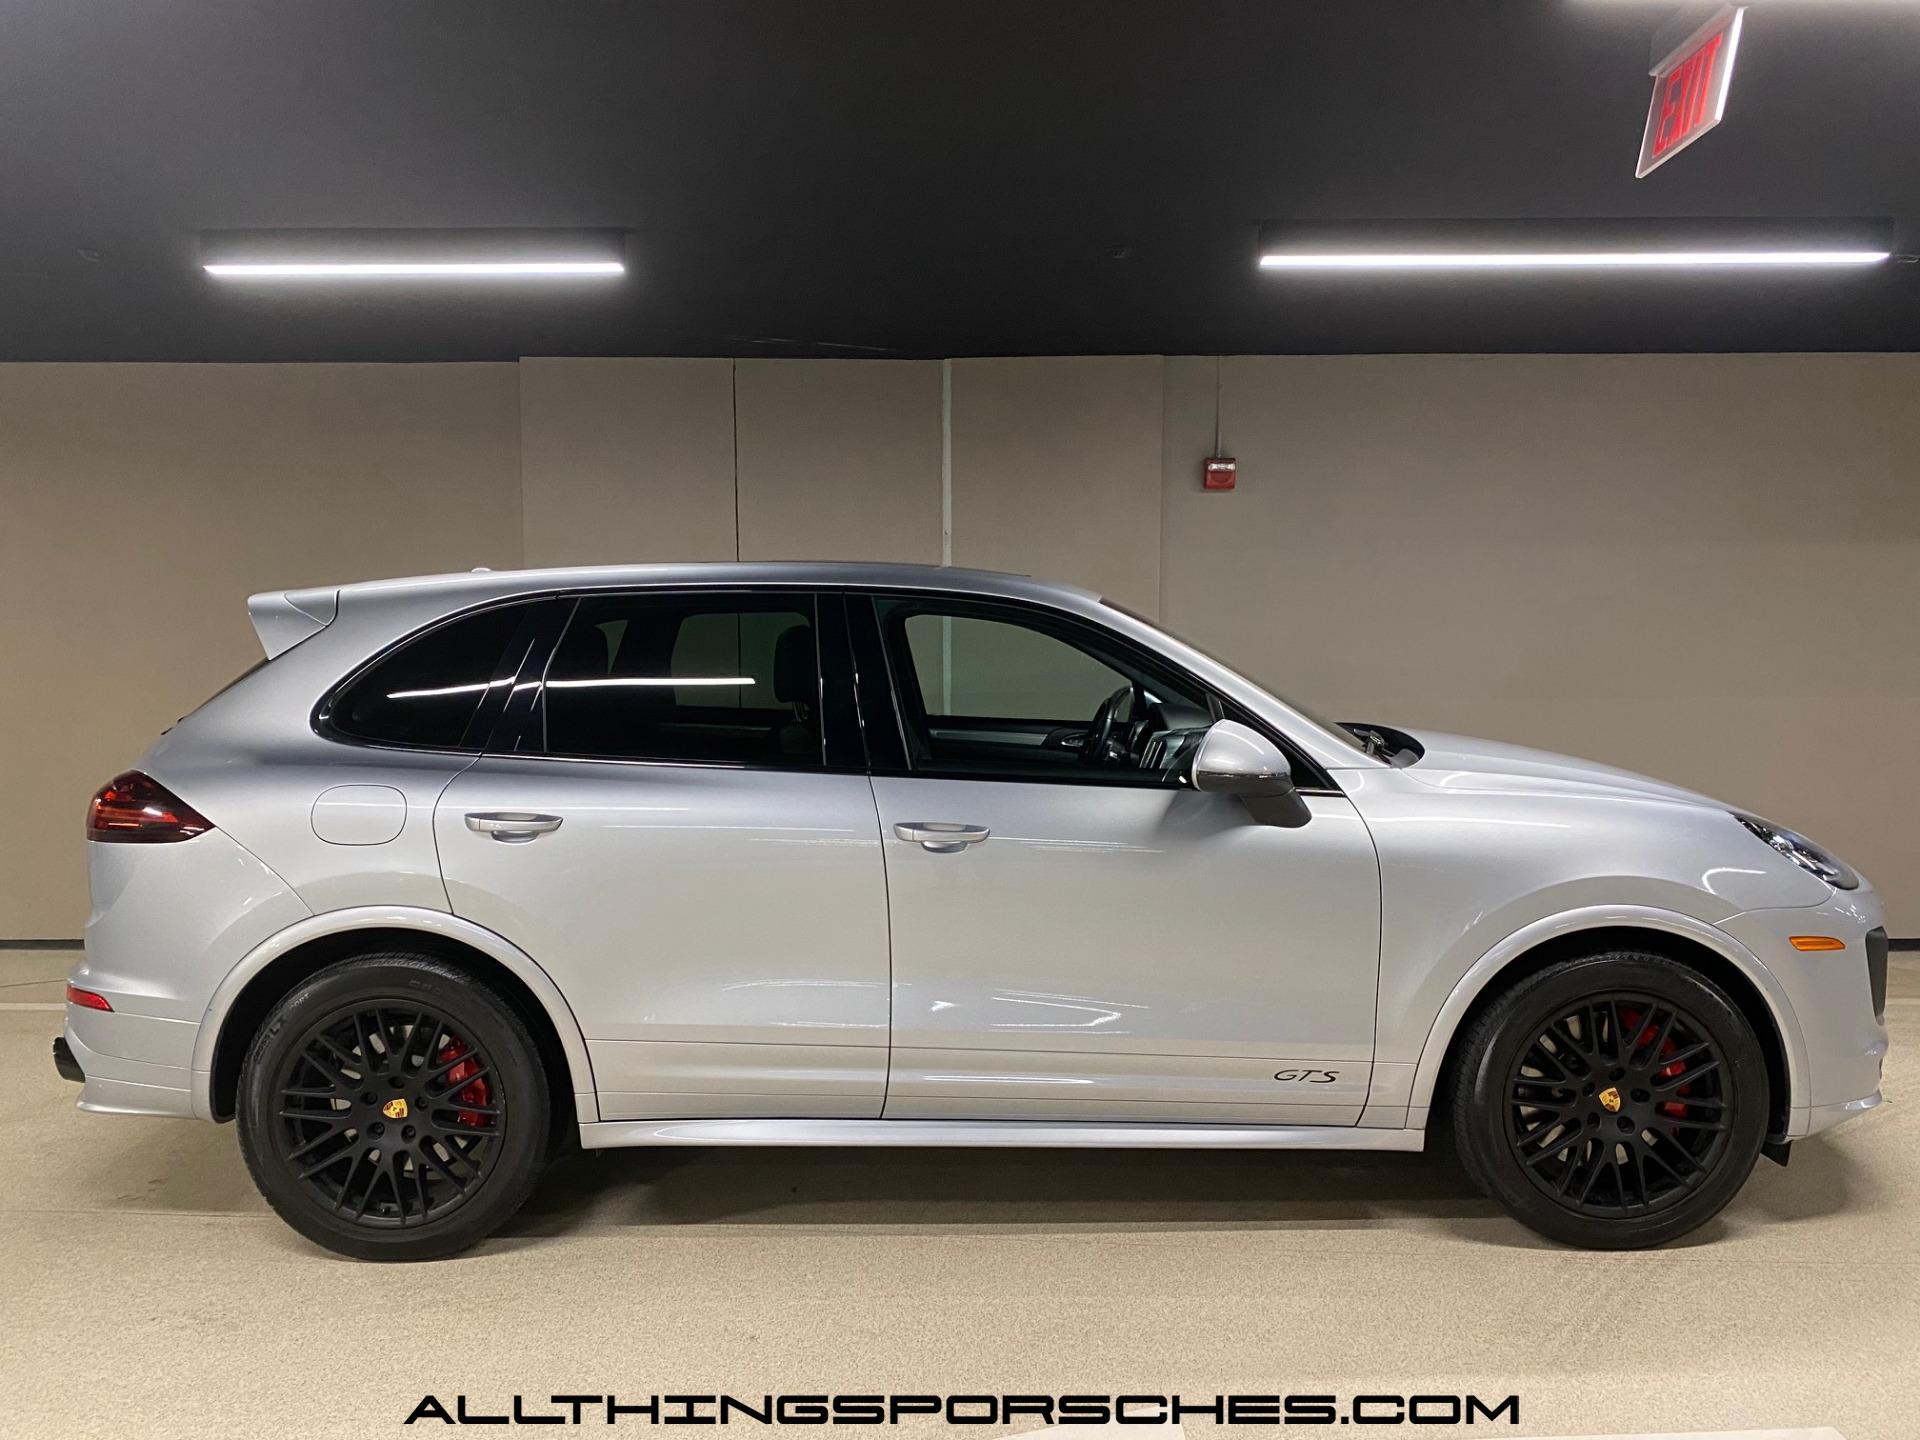 Used 2017 Porsche Cayenne GTS | North Miami Beach, FL